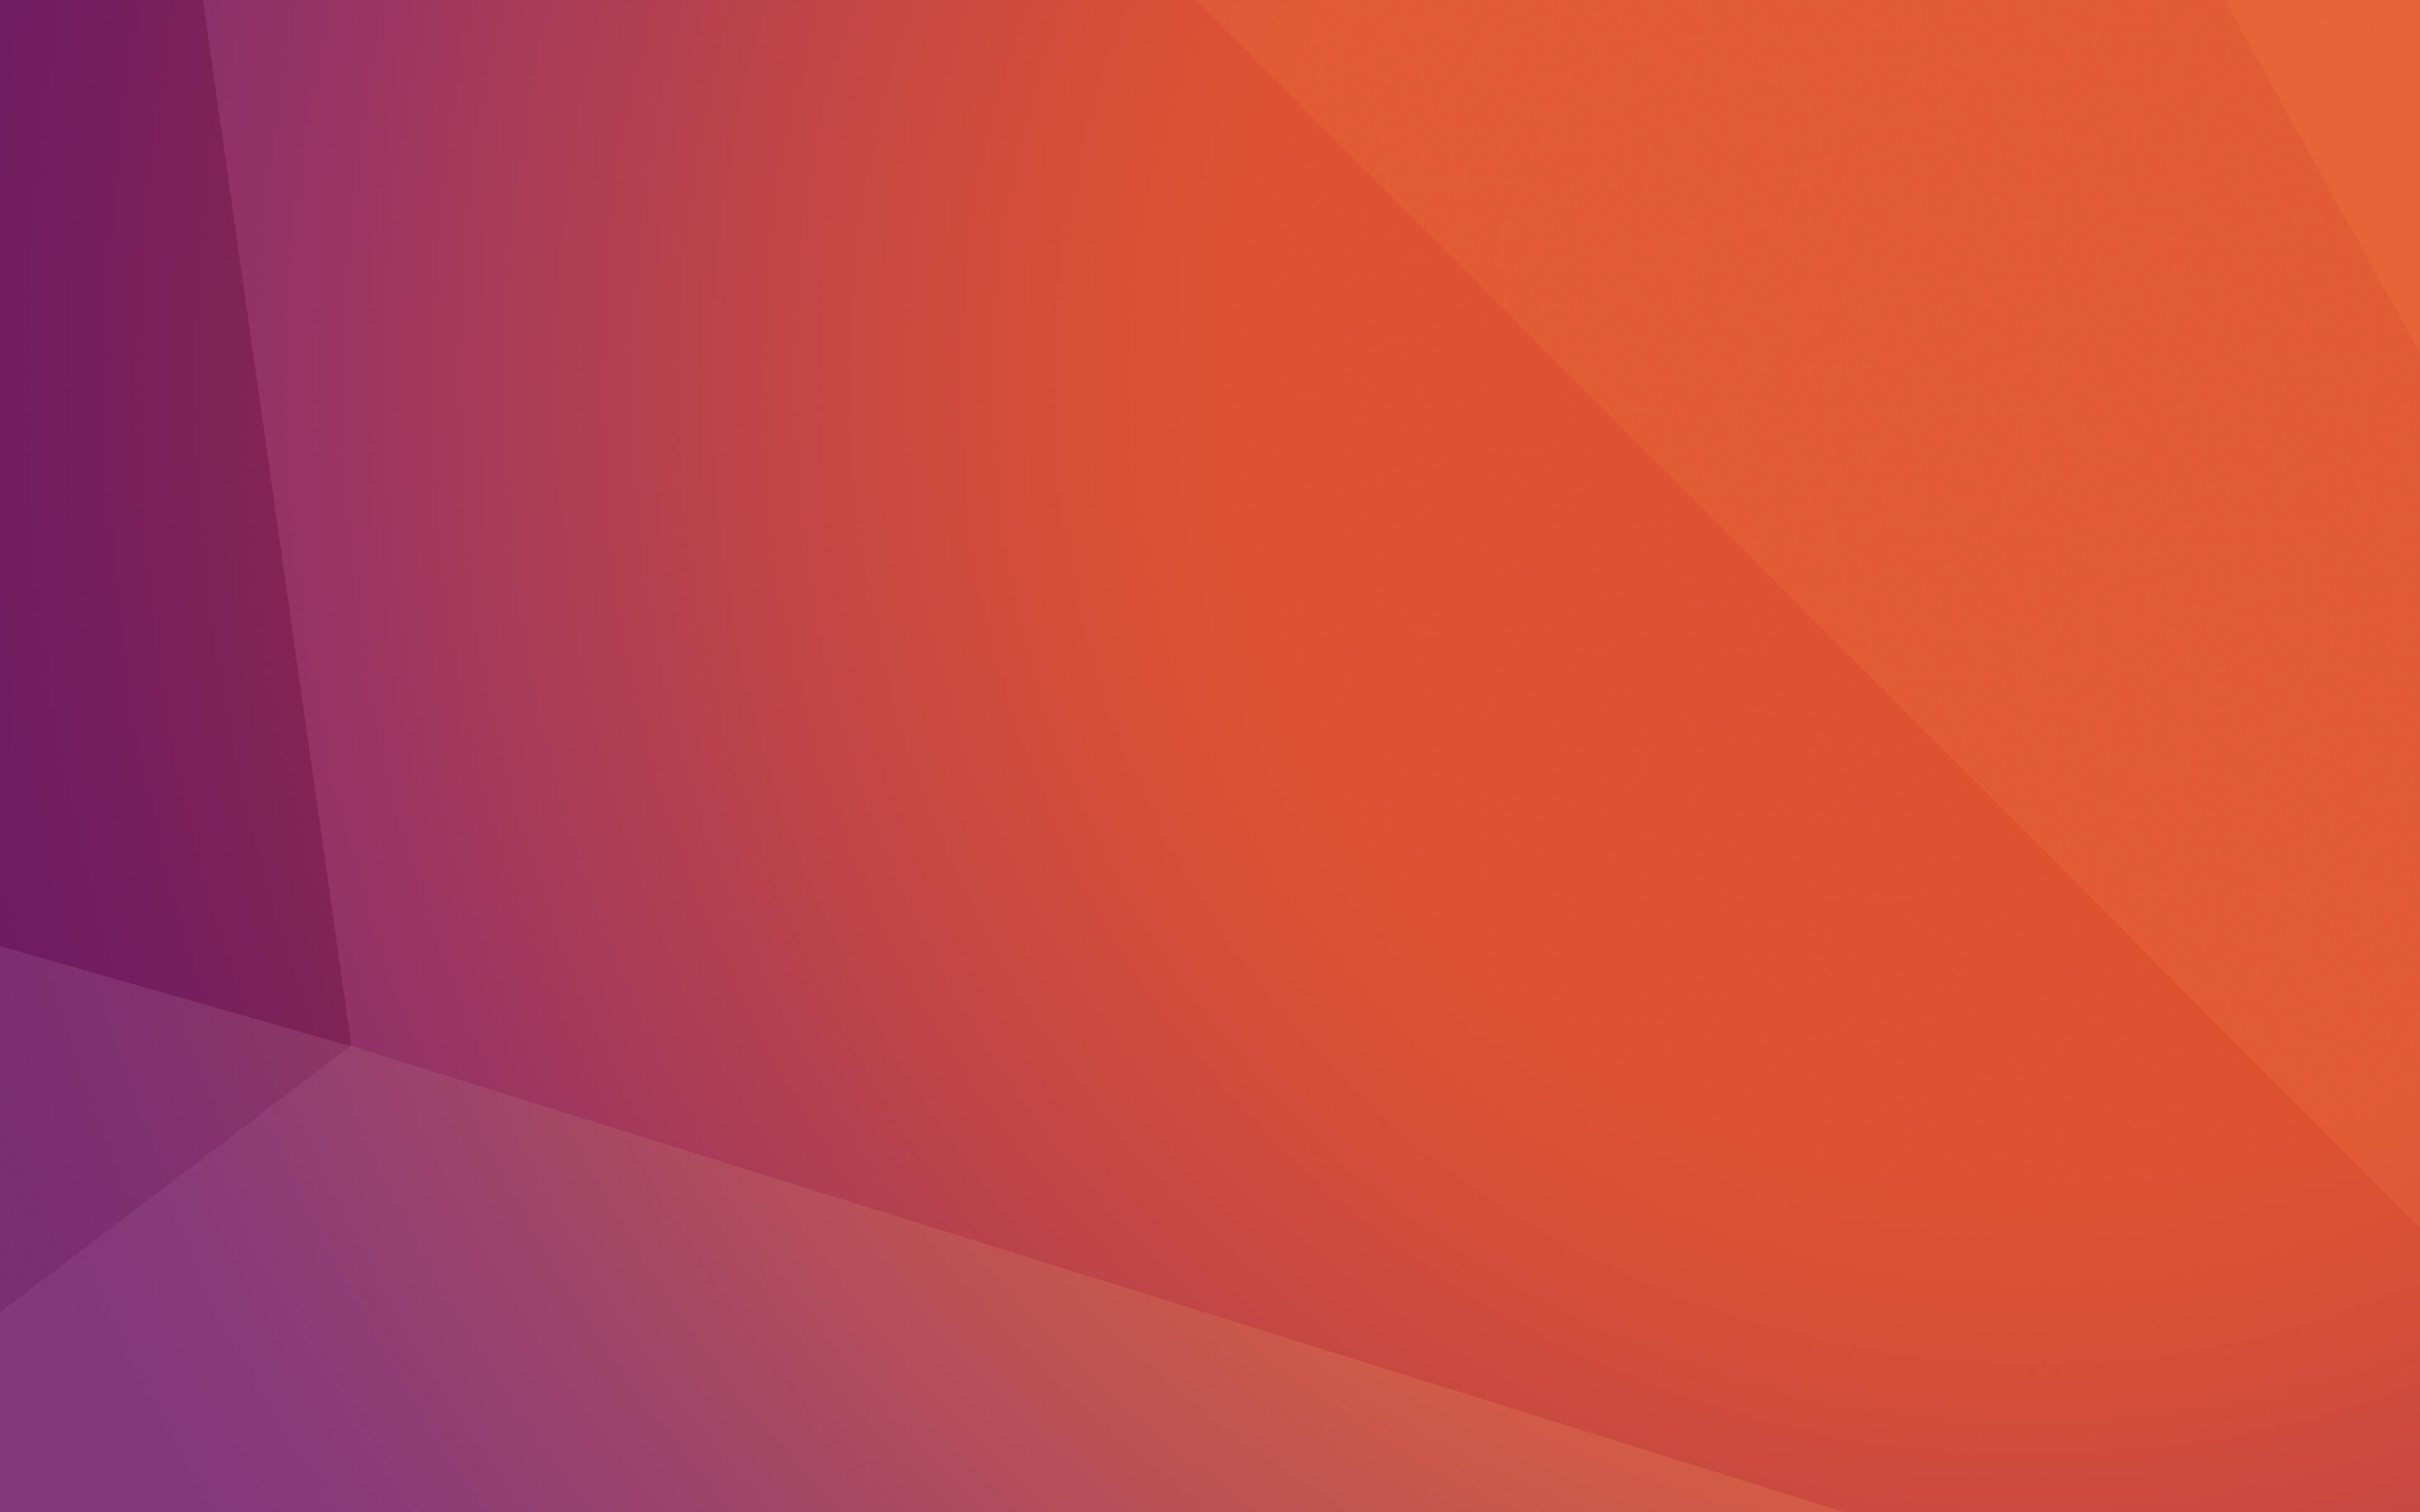 Fondo De Pantalla Ubuntu Of Descarga El Fondo De Pantalla De Ubuntu